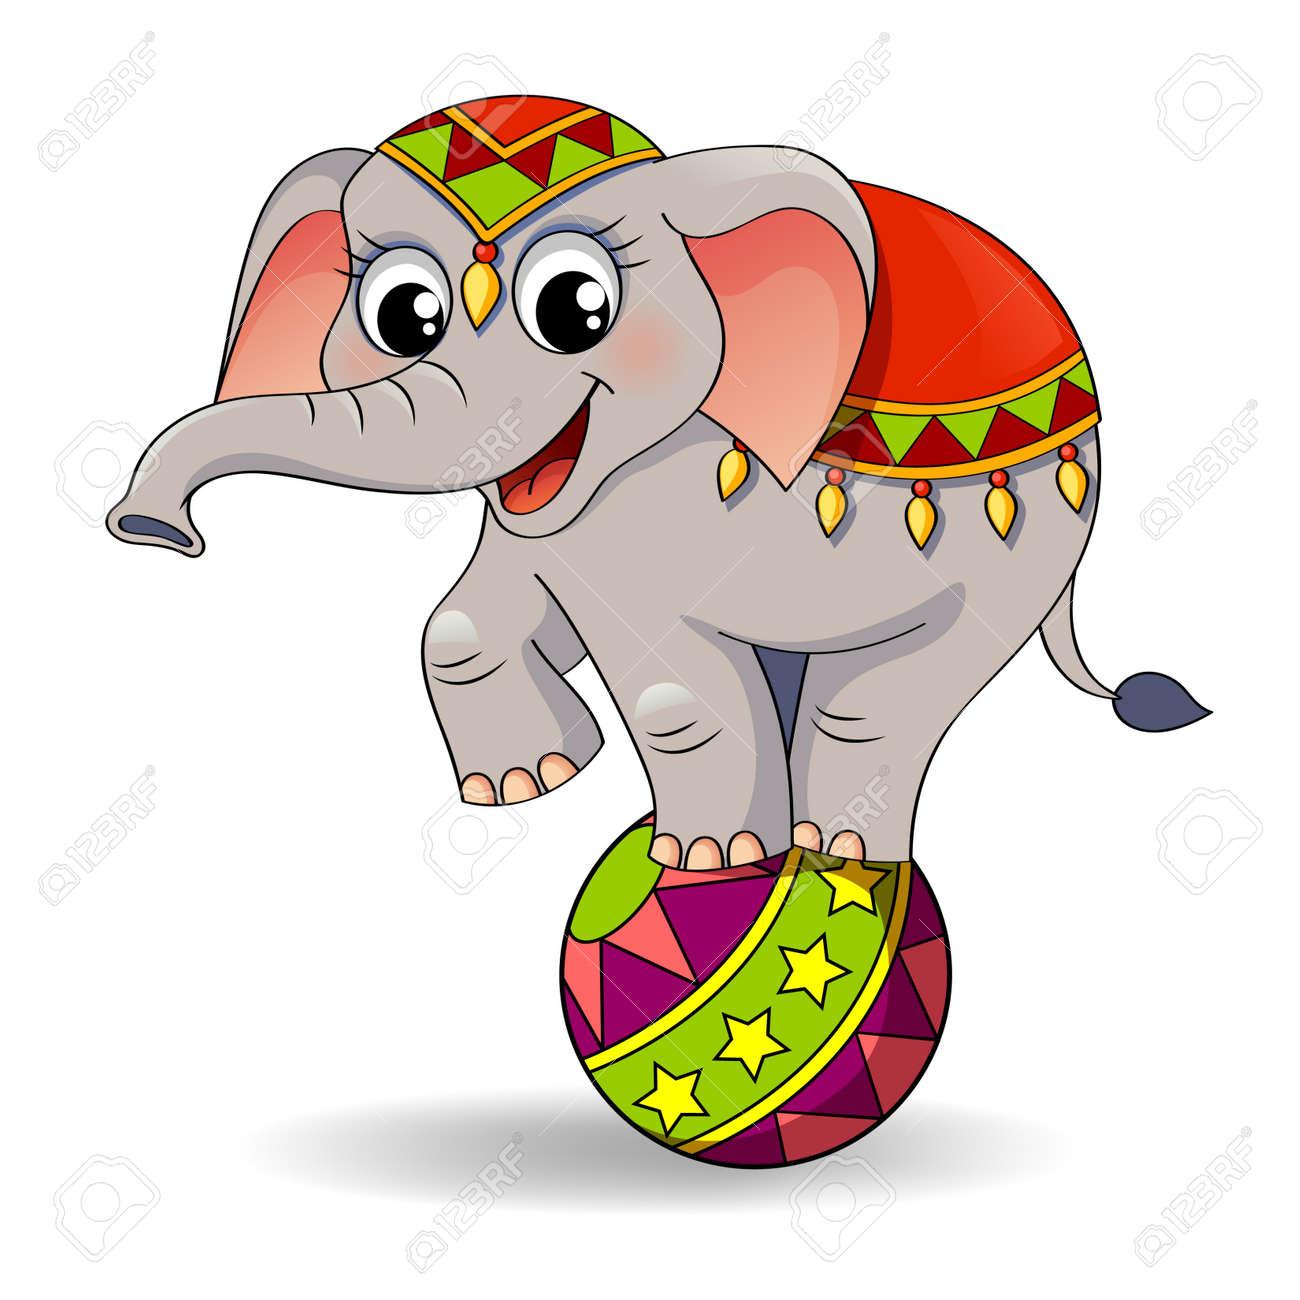 funny cartoon circus elephant balancing on ball royalty free rh 123rf com circus elephant clipart black and white circus elephants clipart